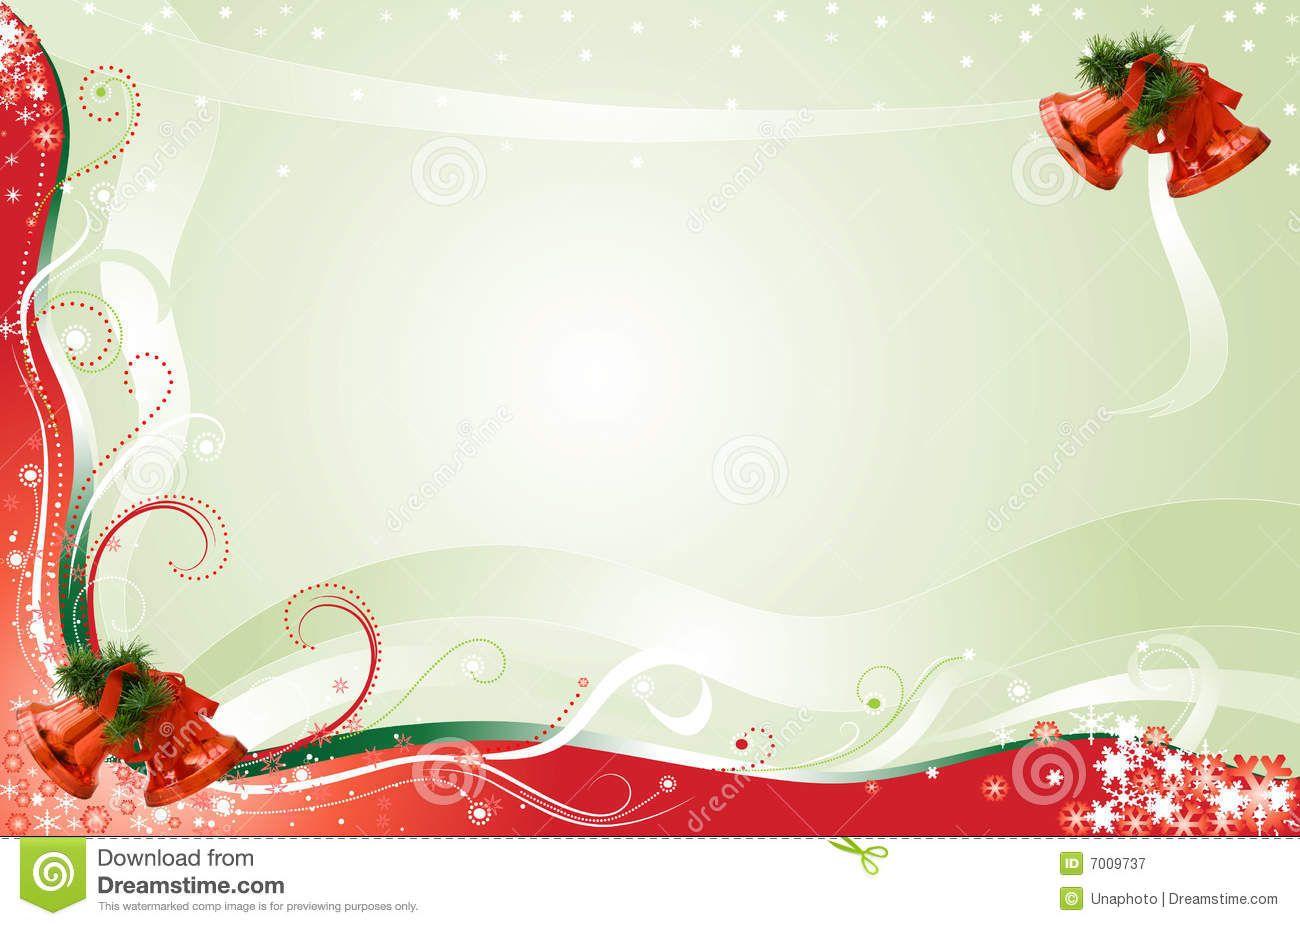 Fondos Verdes De Navidad Para Pantalla Hd 2 Hd Wallpapers: Fondos De Navidad Con Hadas Para Fondo De Pantalla En 4K 7